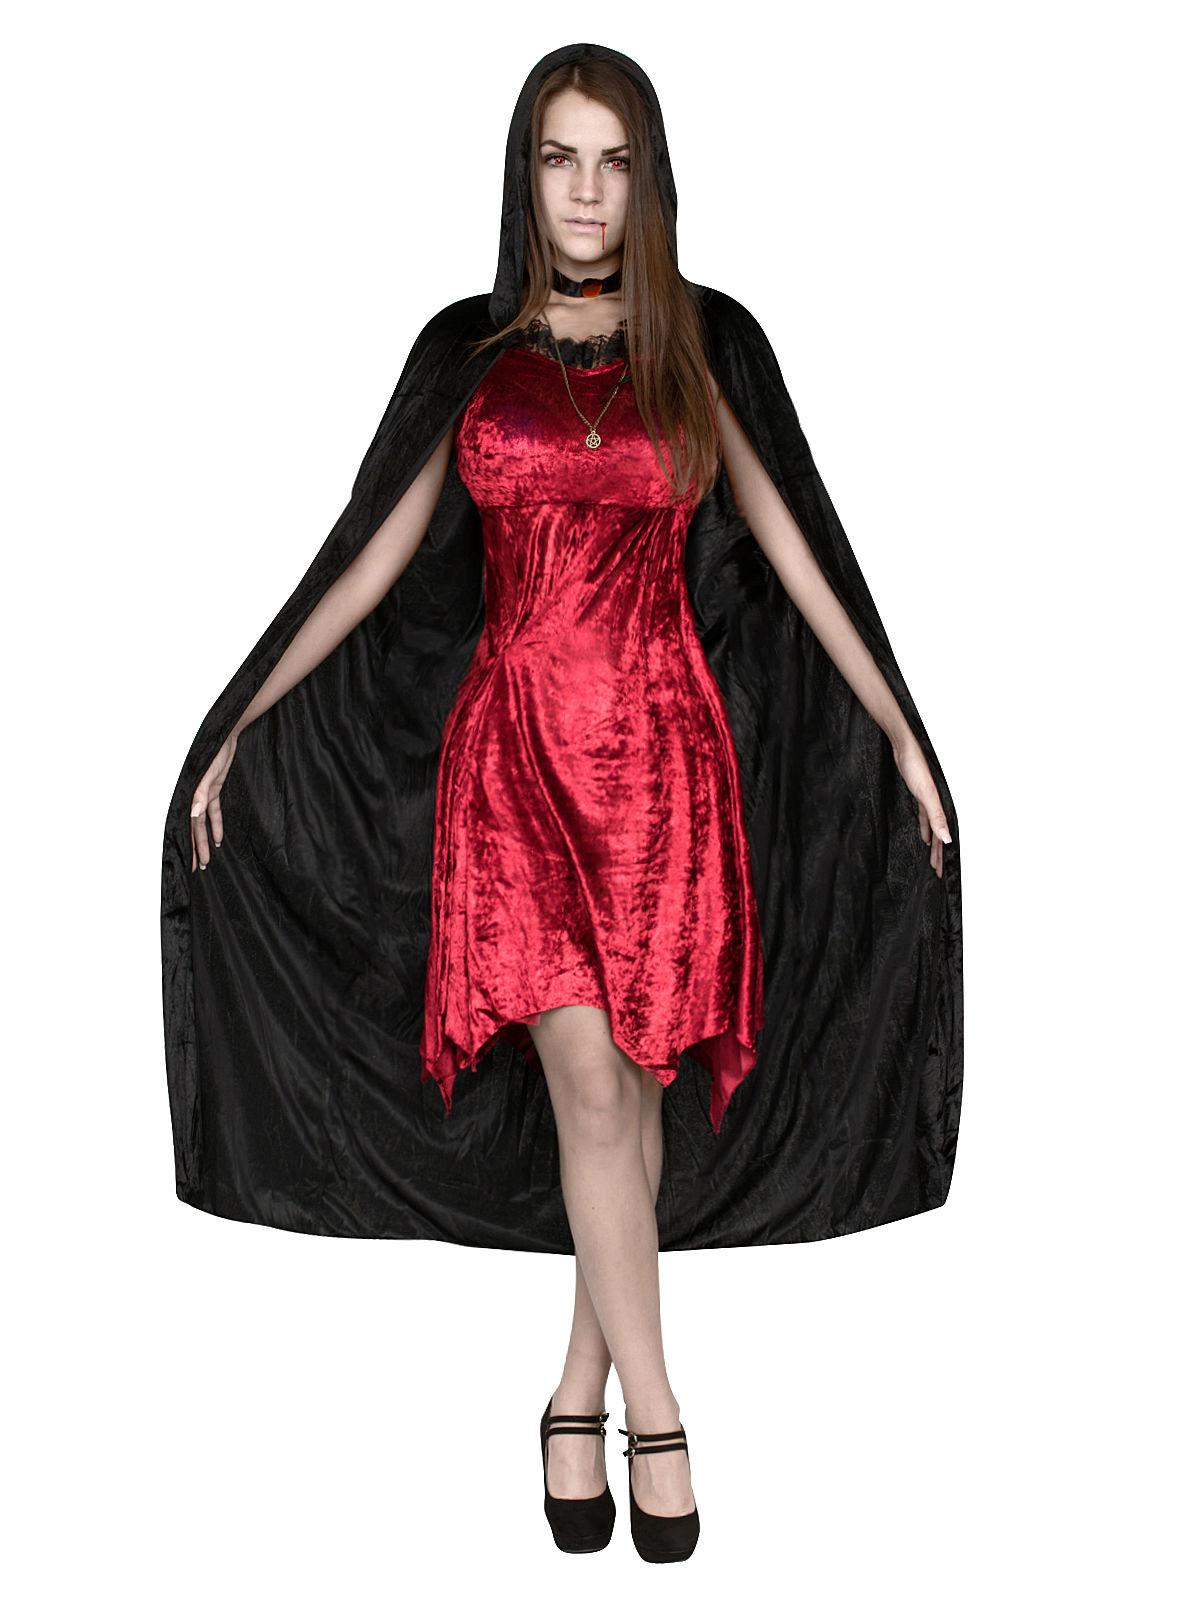 p duestere hexe halloween damenkostuem vampirin rot schwarz